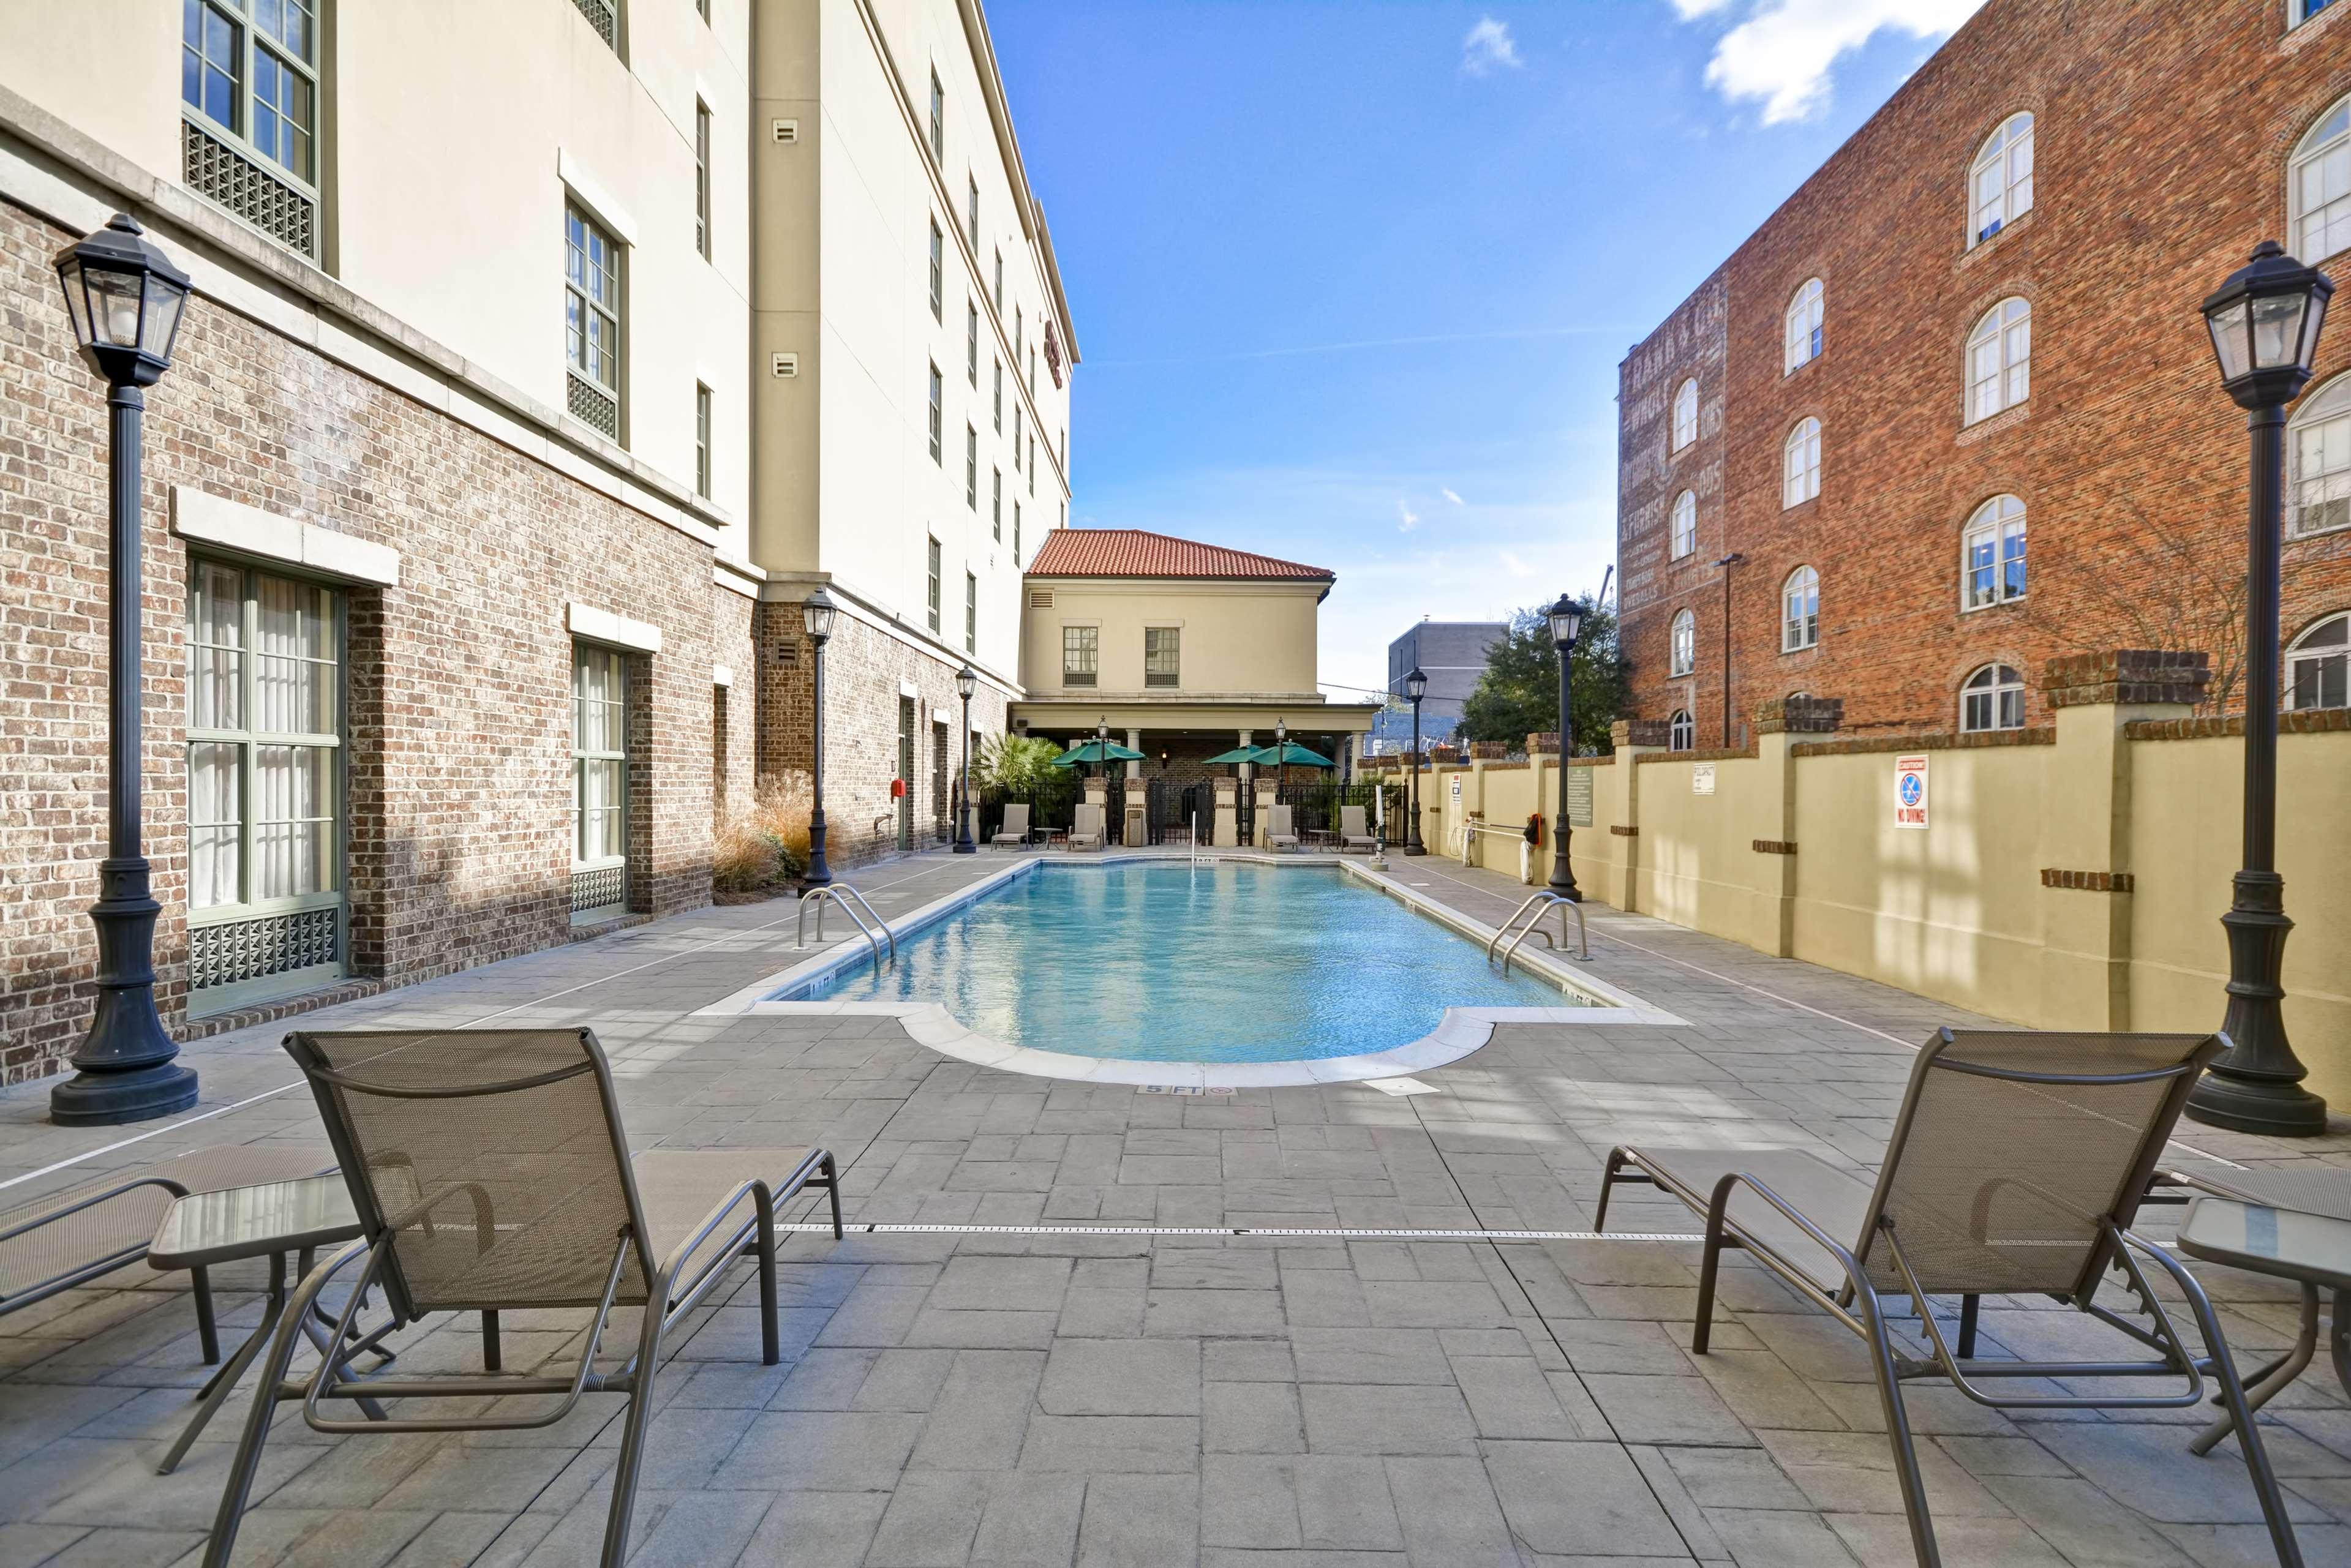 Hampton Inn & Suites Savannah Historic District image 14